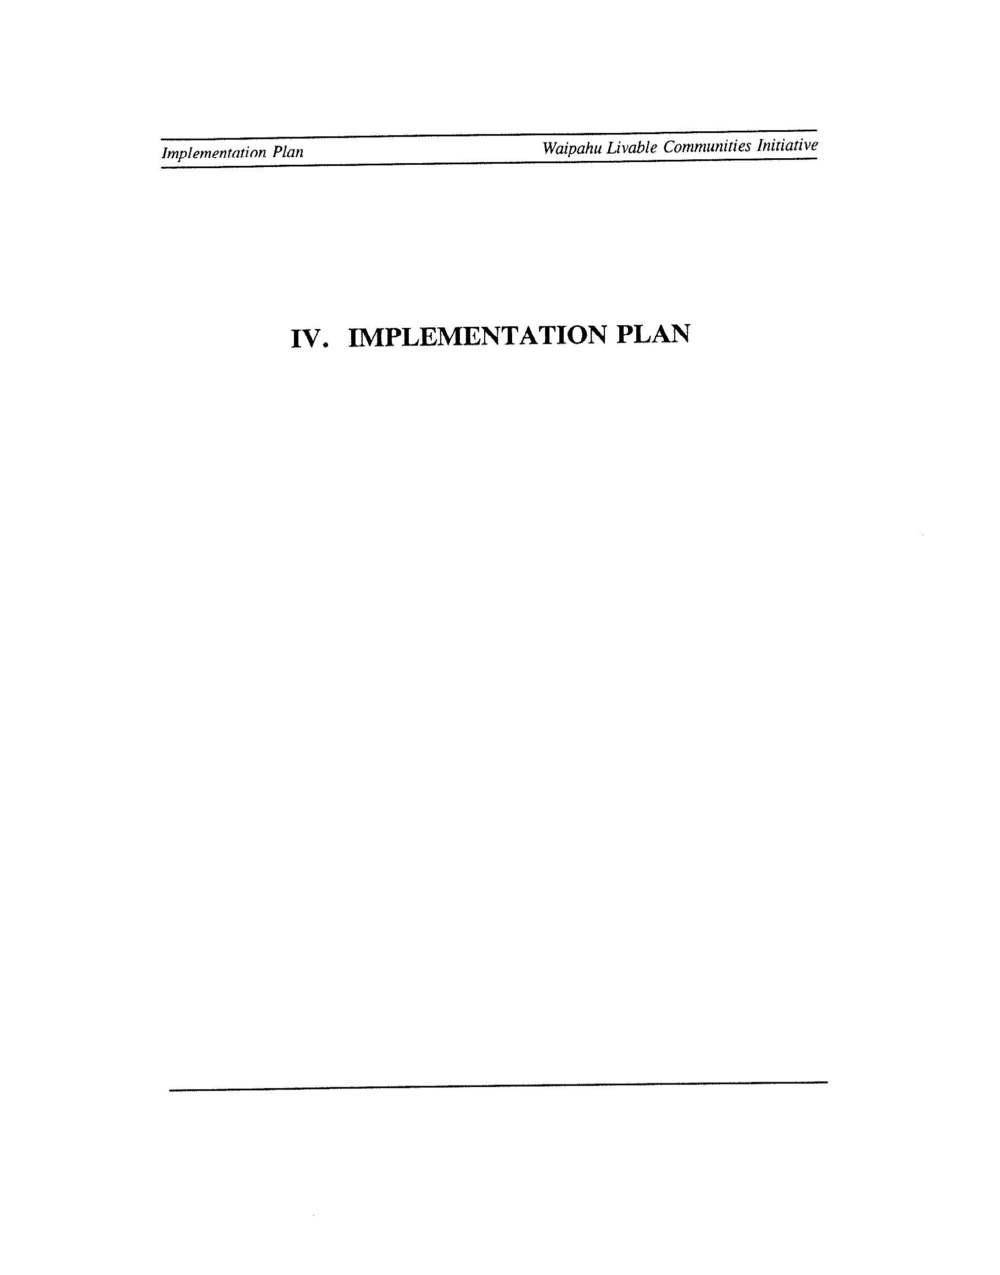 160531_WaipahuLivableCommunities(1998)_Page_125.jpg